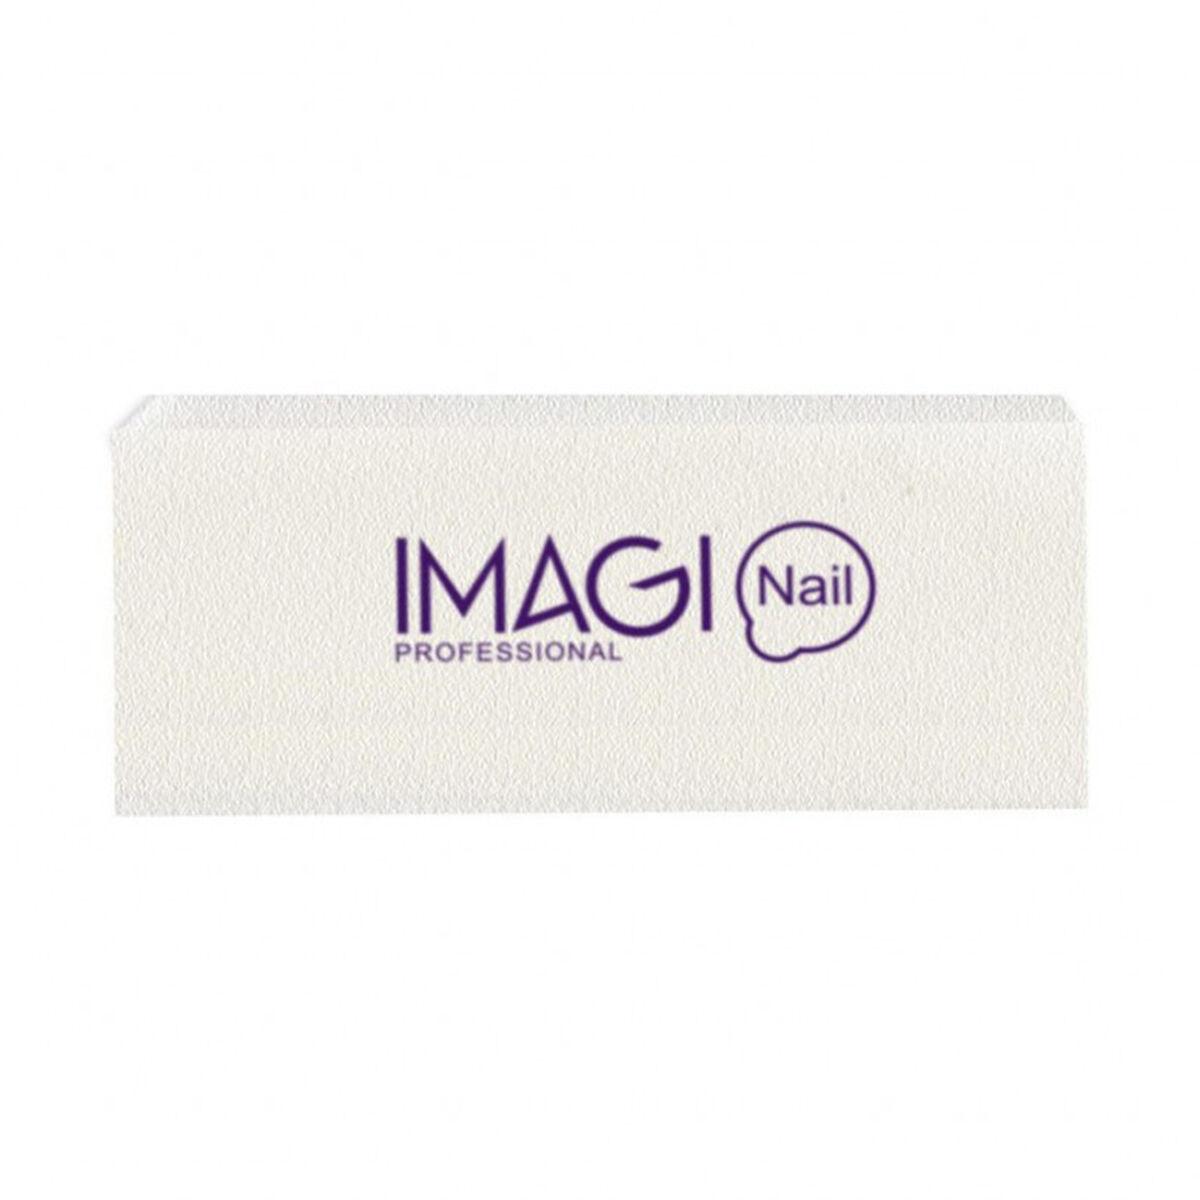 Imaginail Mini Block Blanco